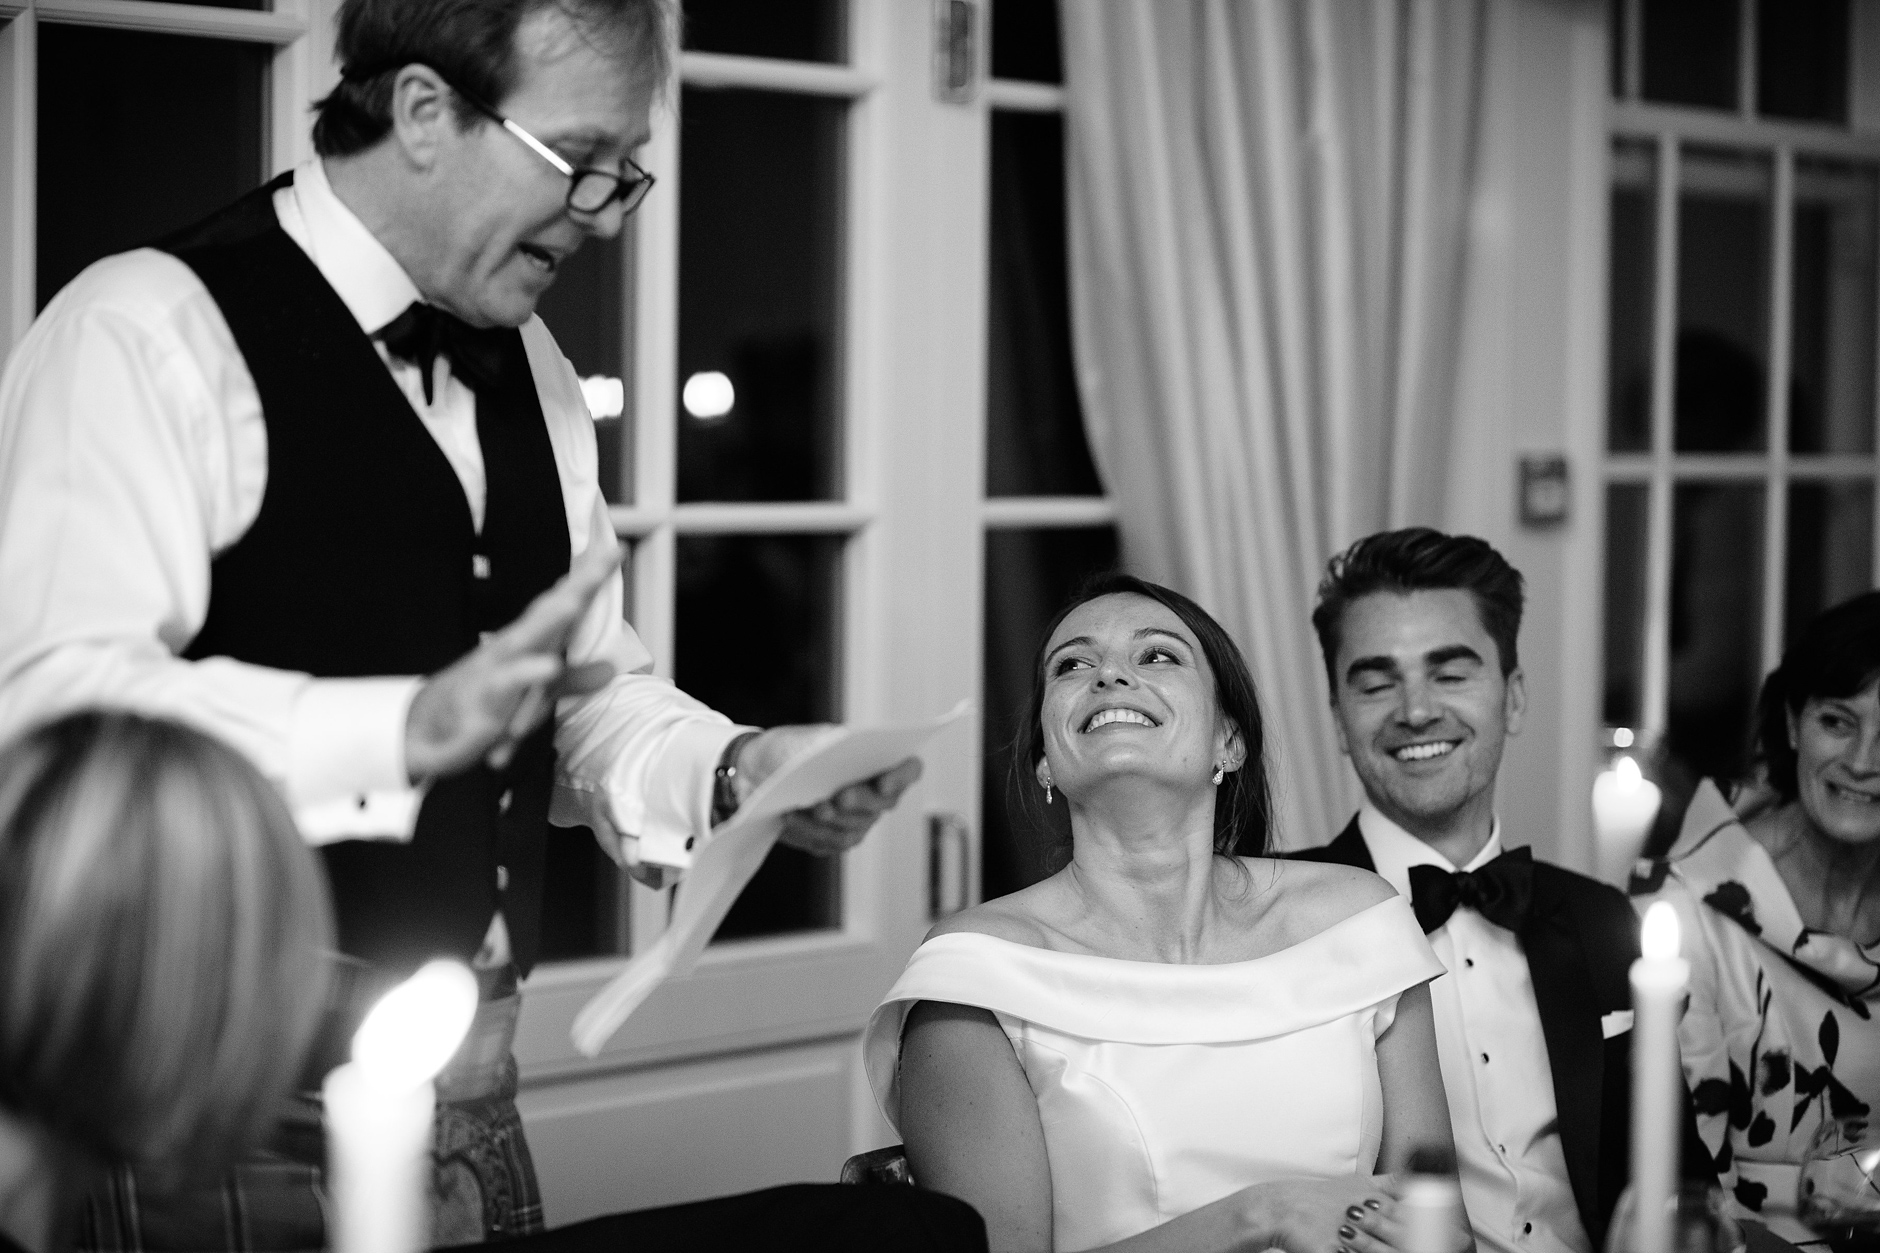 Glentruim-Wedding-Nikki-Leadbetter-Photography-268.jpg